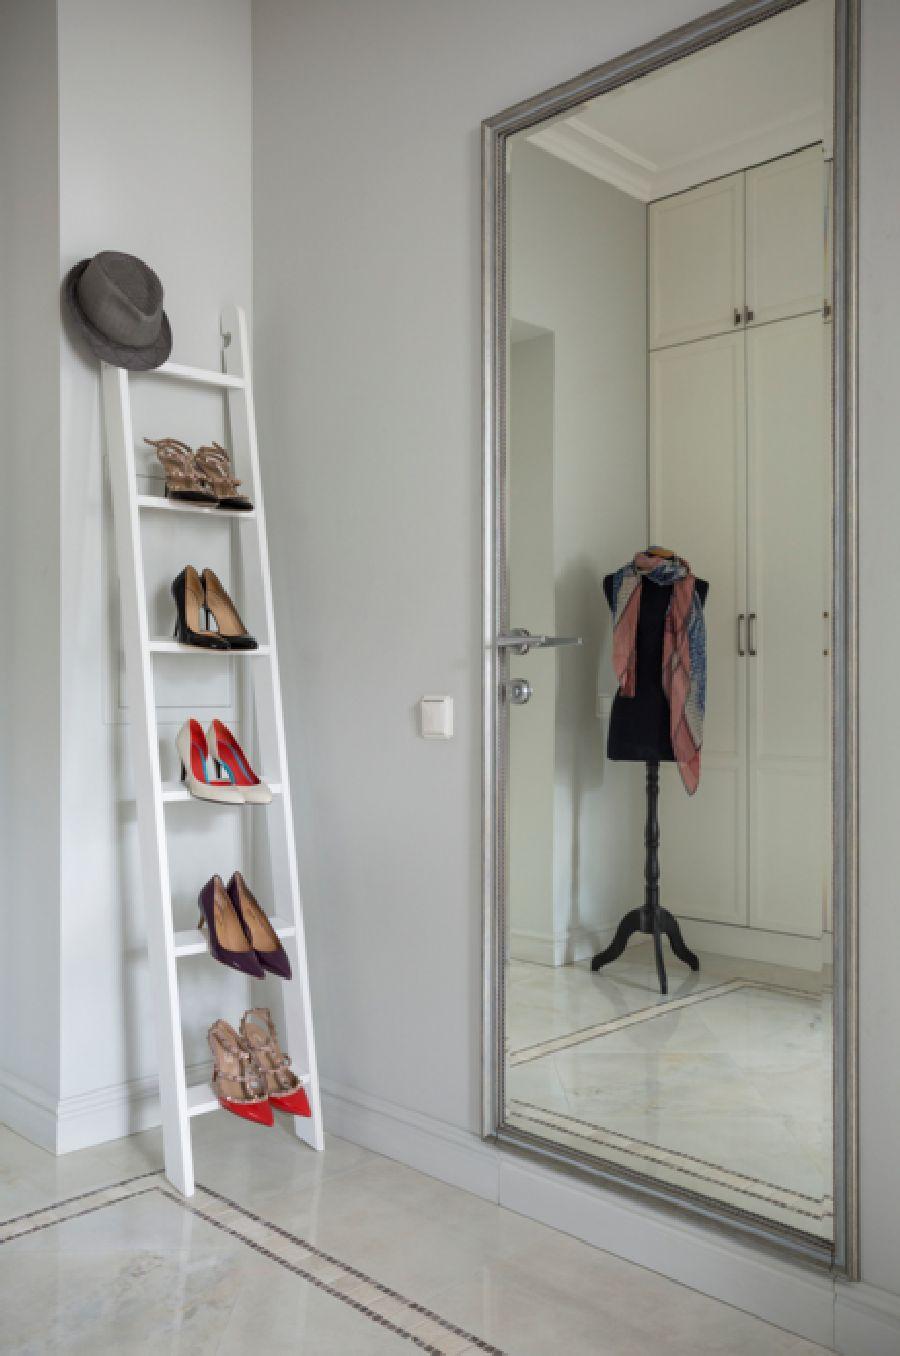 adelaparvu.com despre apartament de 80 mp patrati cu aer rustic elegant, locuinta Rusia, designer Zhenya Zhdanova (16)